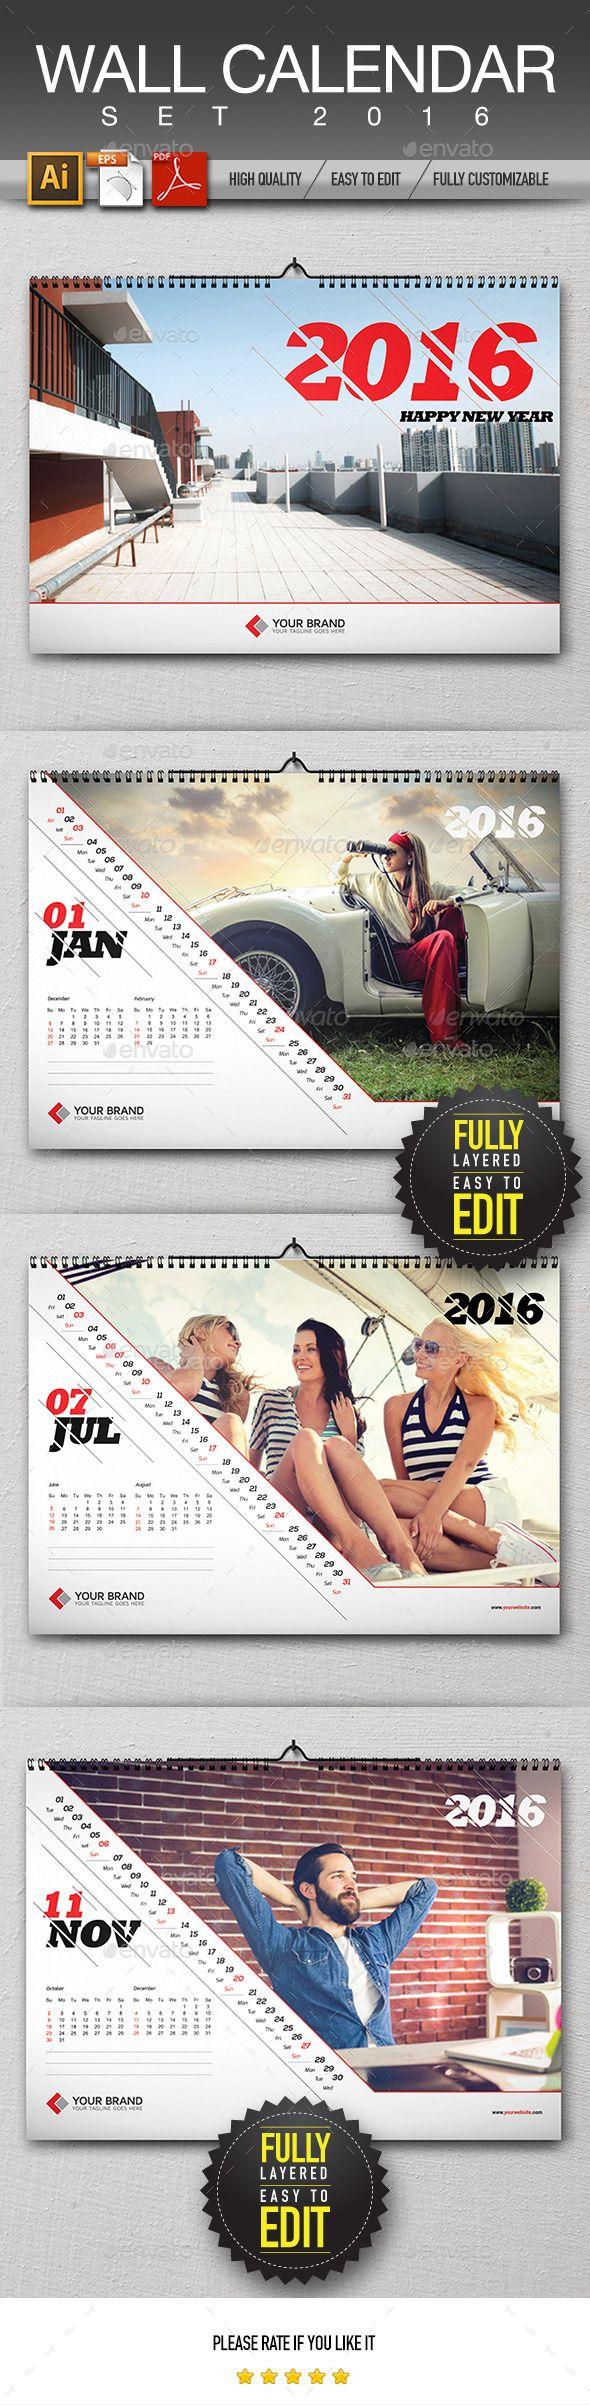 Wall Calendar Design AI, EPS, PDF Template #design Download: http://graphicriver.net/item/wall-calendar-design-2016/13028224?ref=ksioks